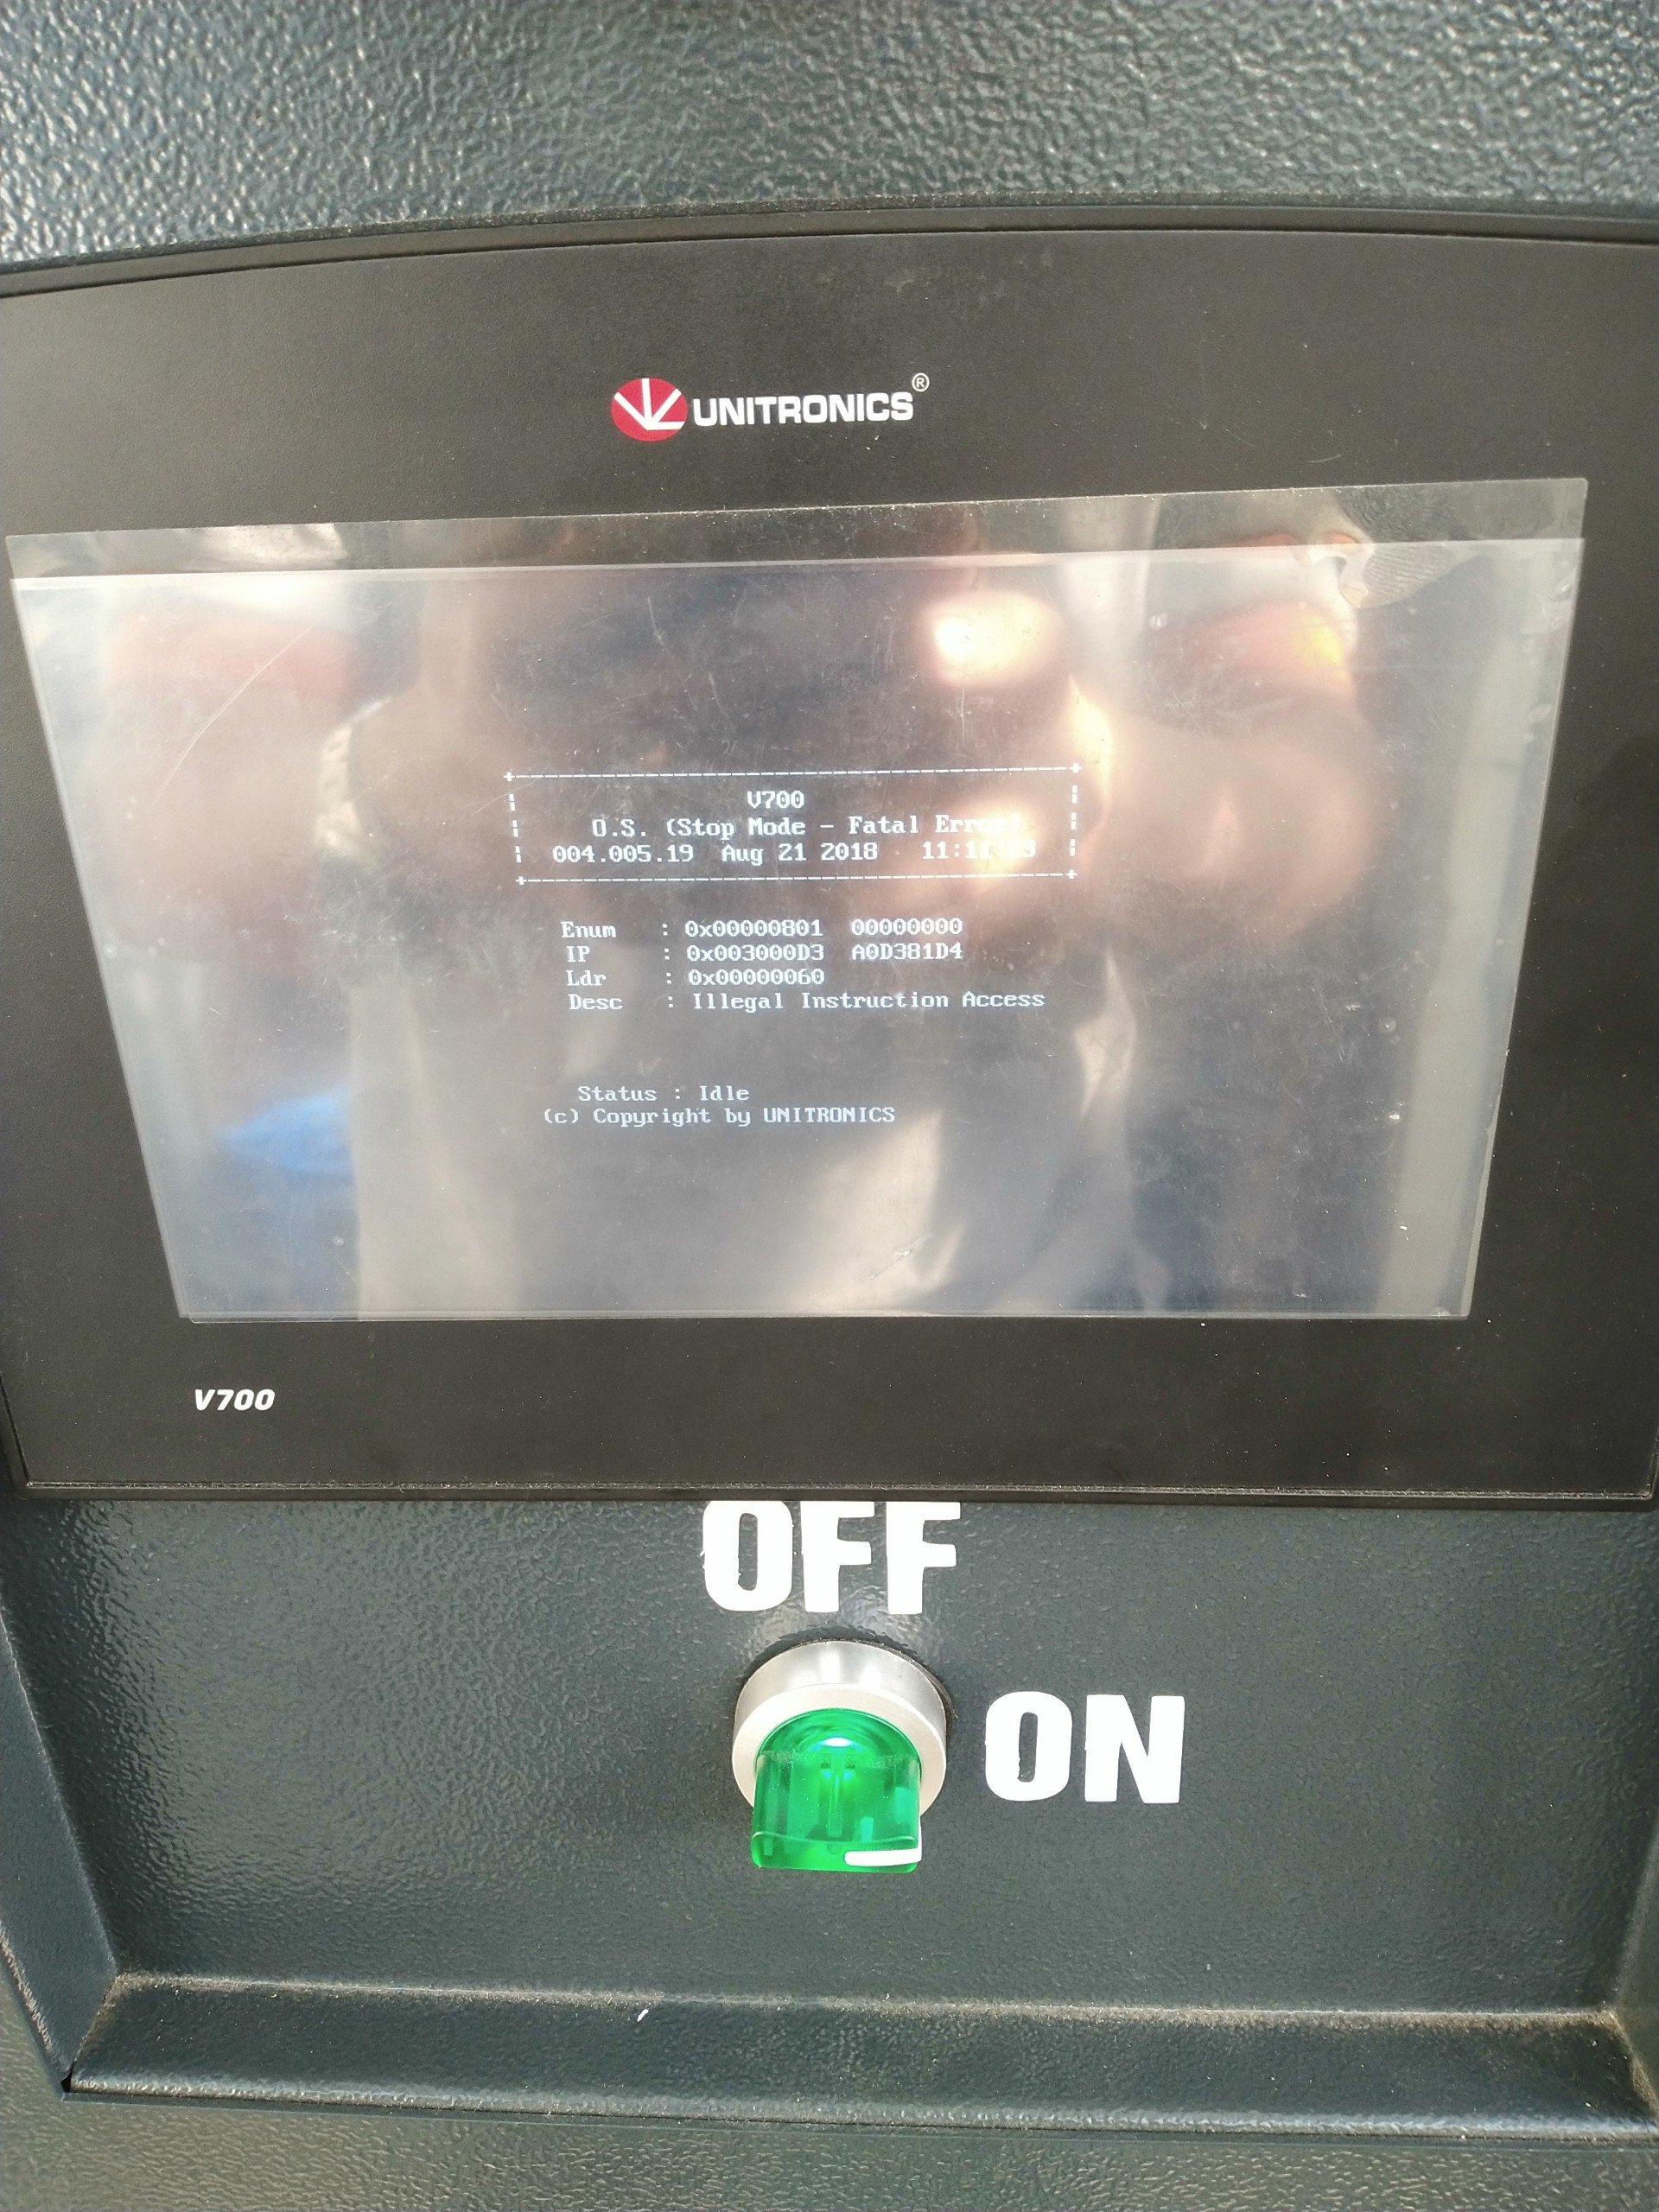 v700- stop mode fatal error - Vision & Samba PLC + HMI